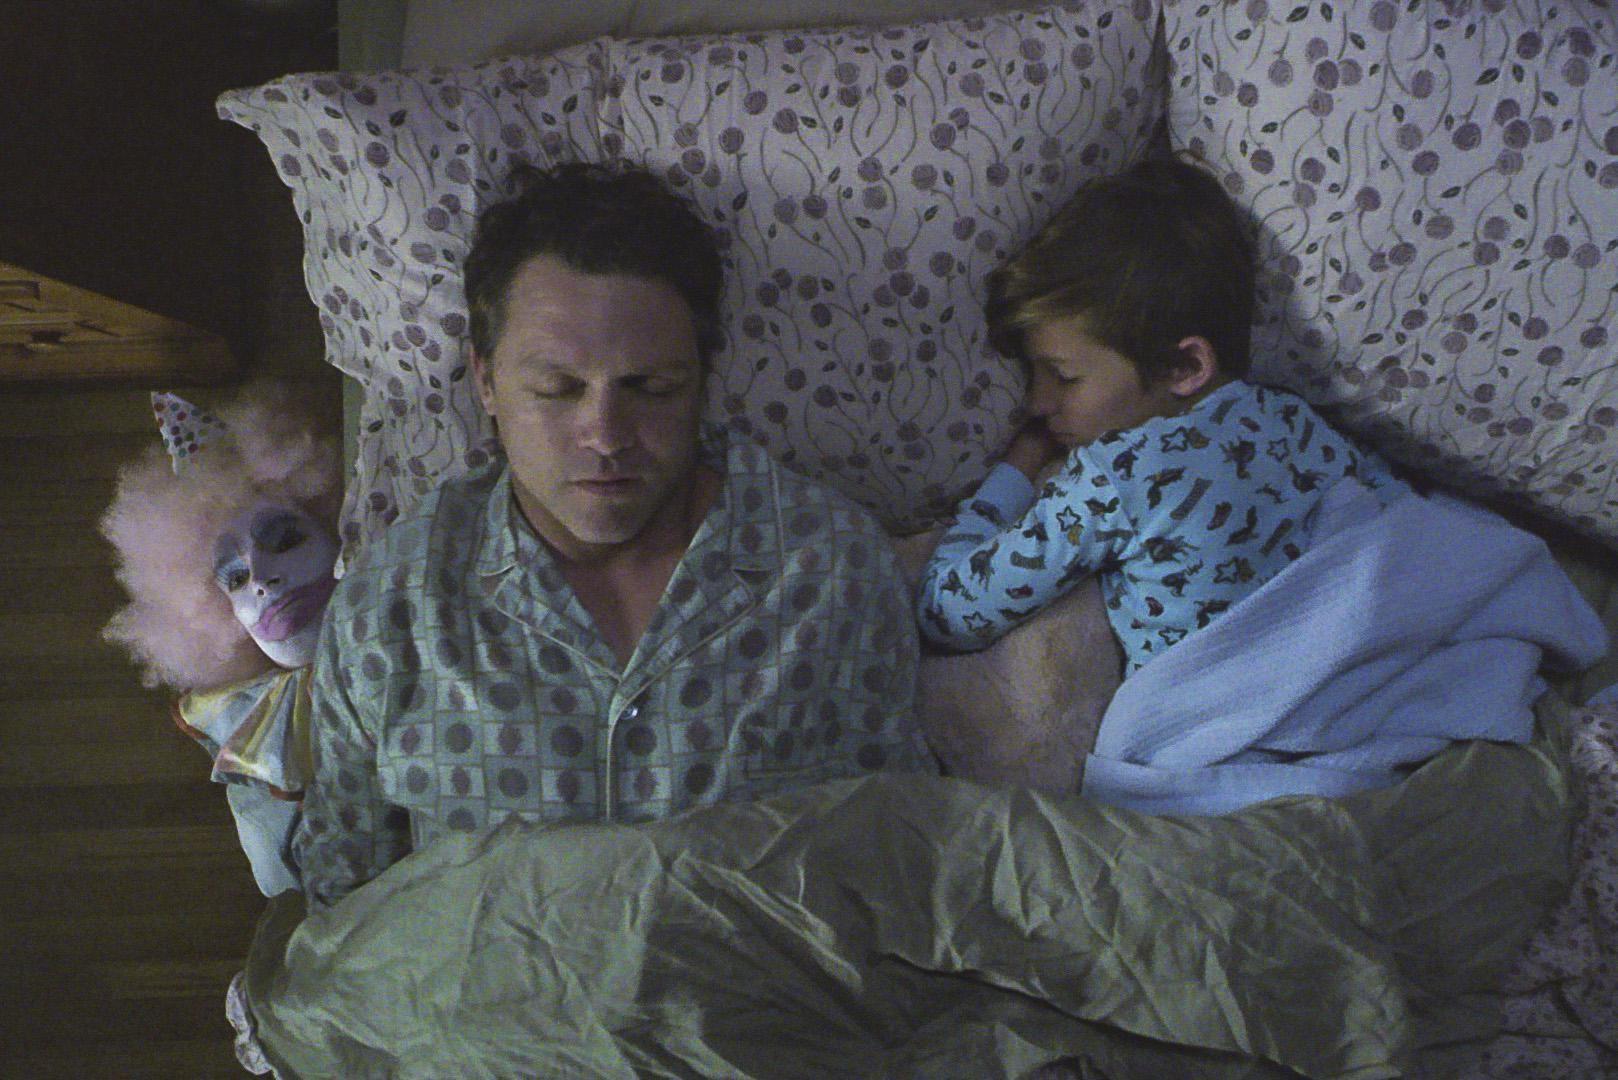 Criminal Minds season 13 episode 17 Directed by Matthew